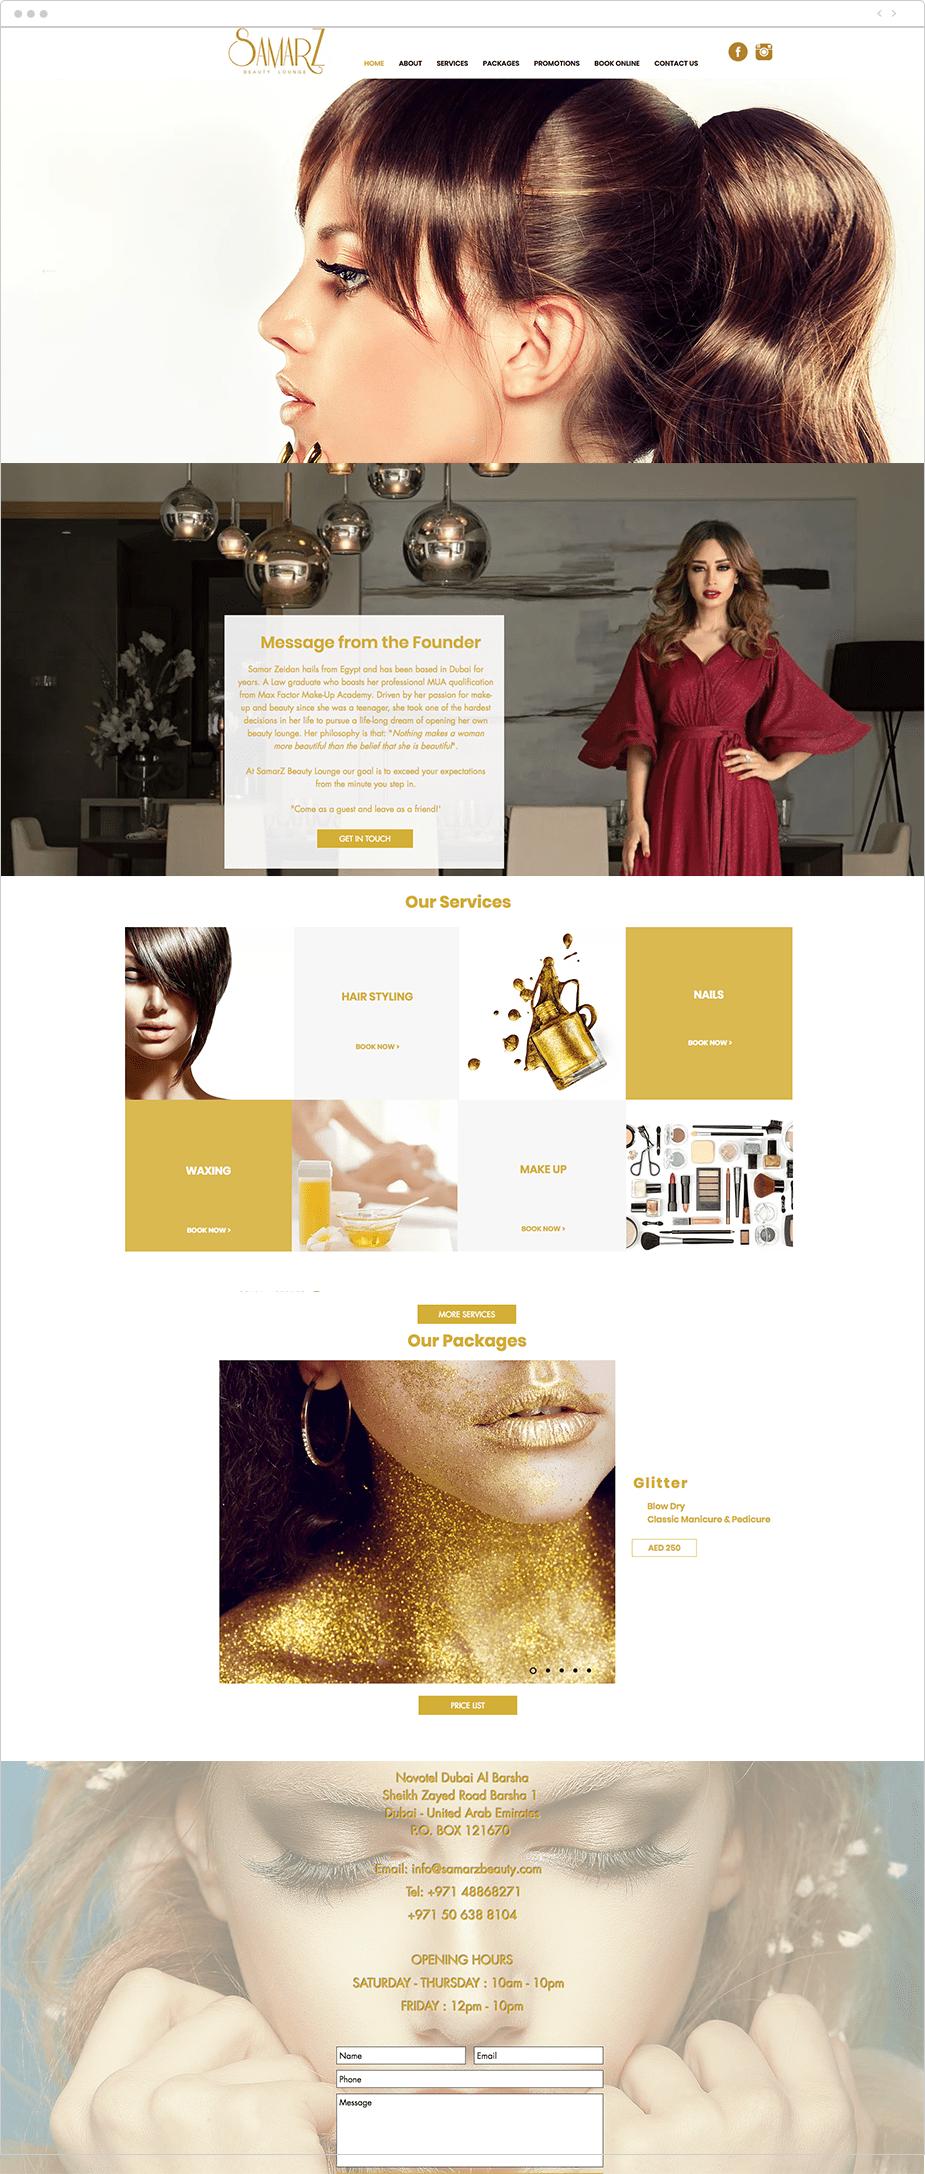 Wix Bookings website: Samarz Beauty